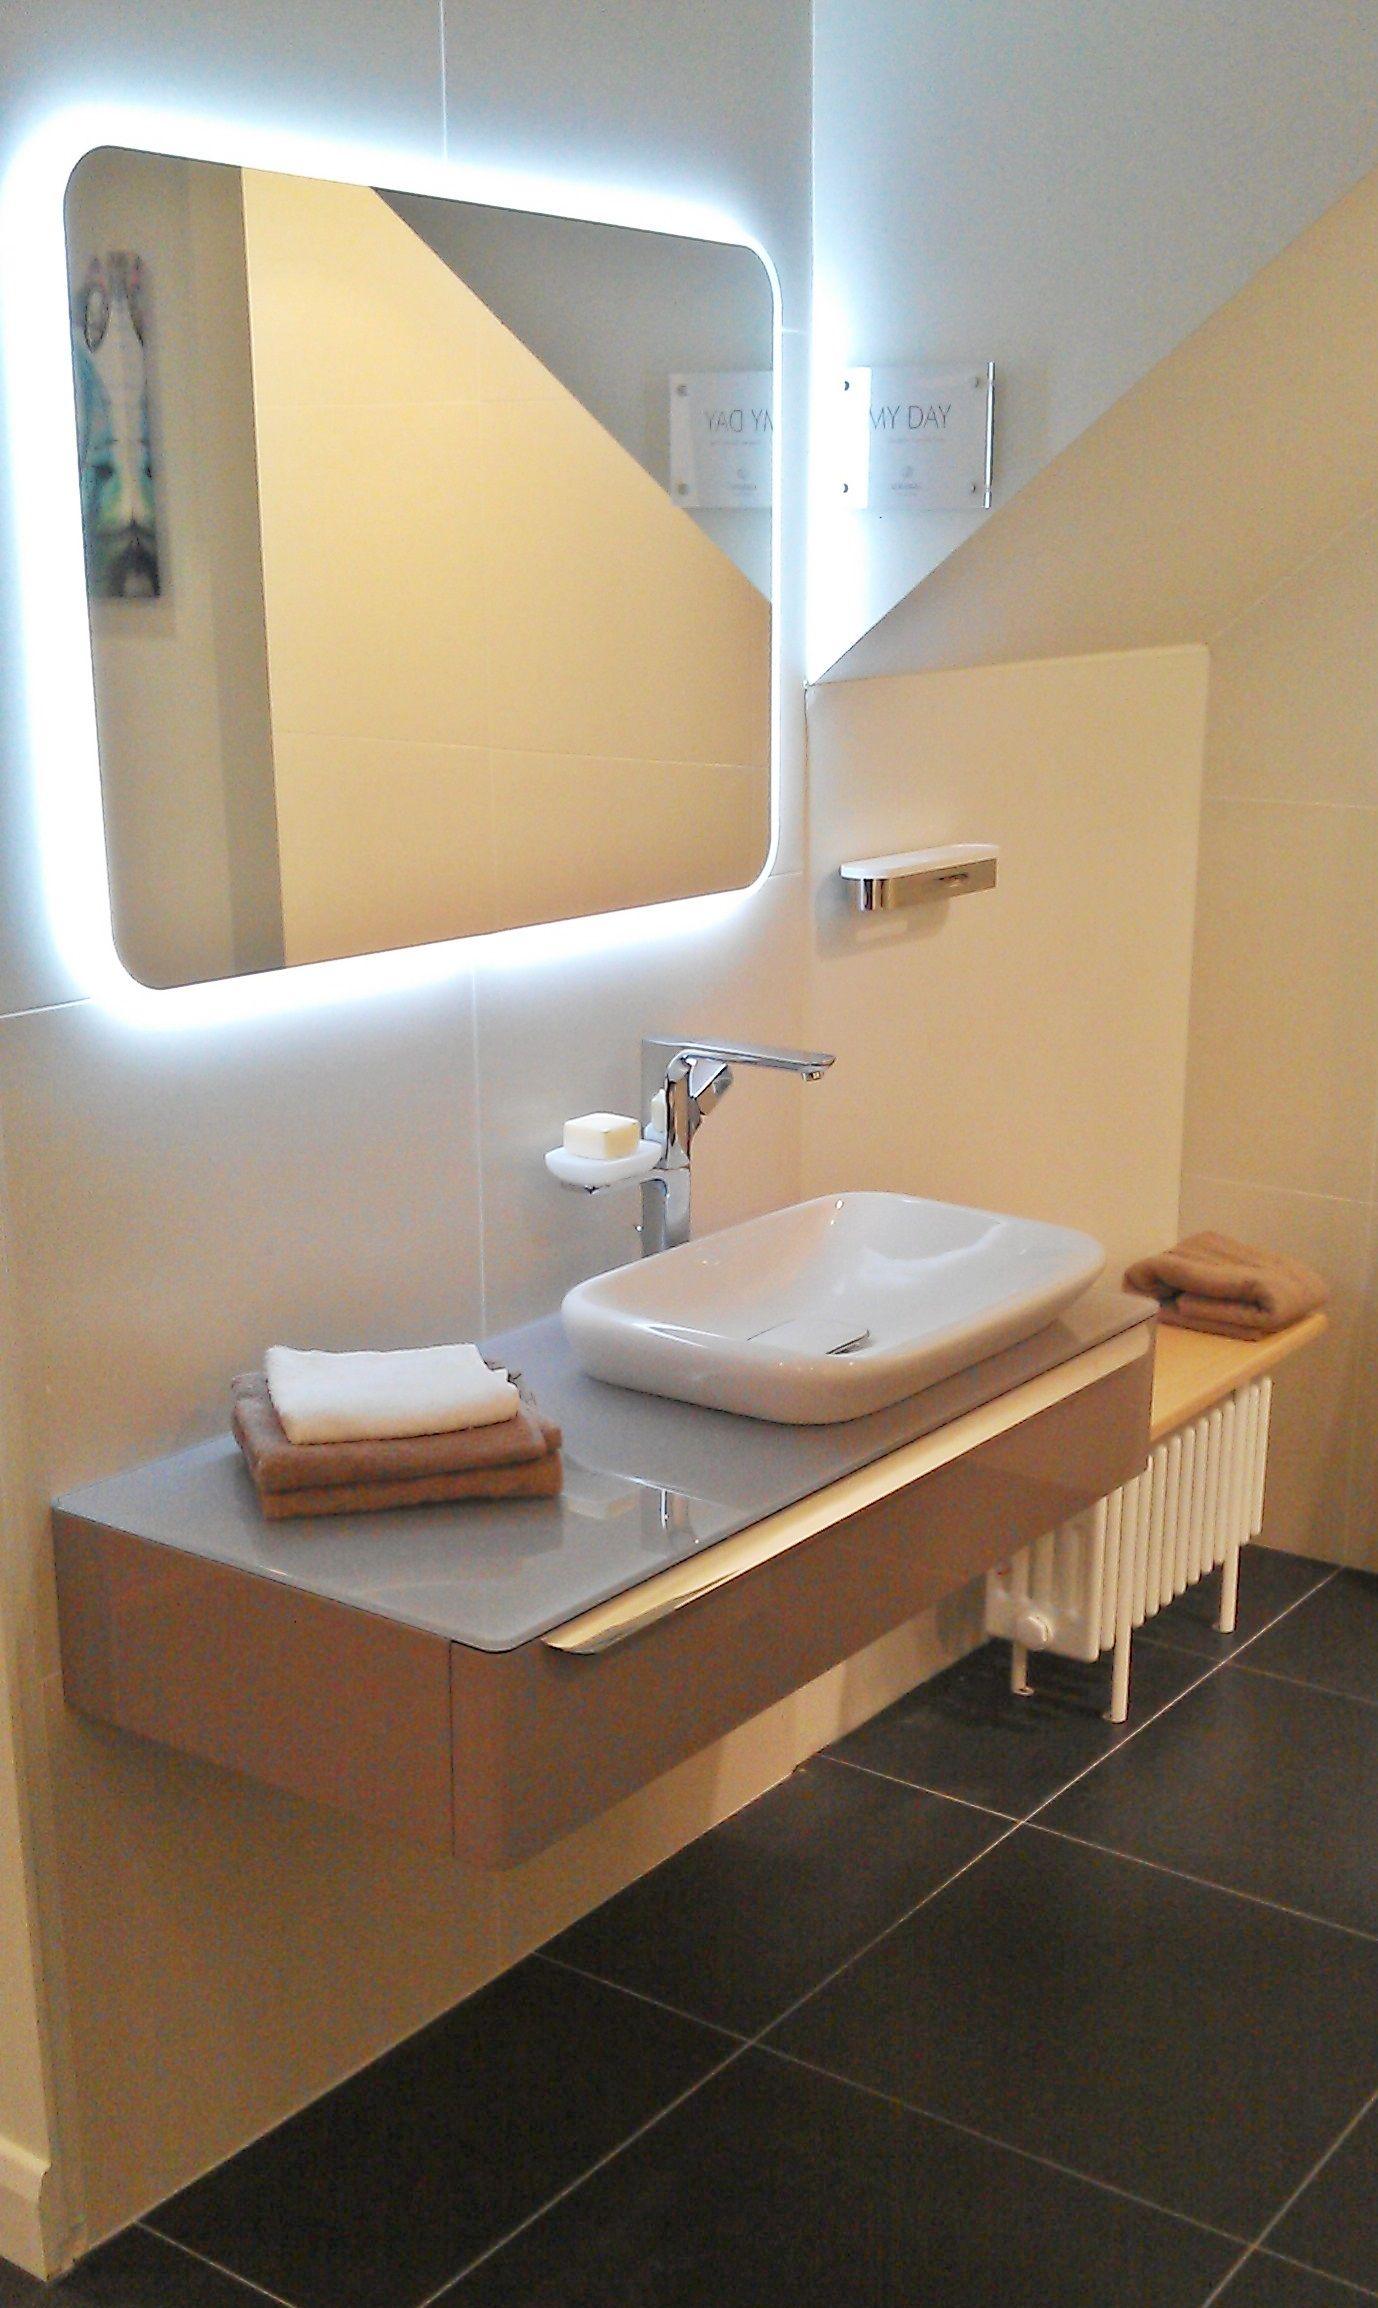 Keramag My Day łazienka Pinterest Bathroom Showrooms And Showroom - Bathroom showrooms in my area